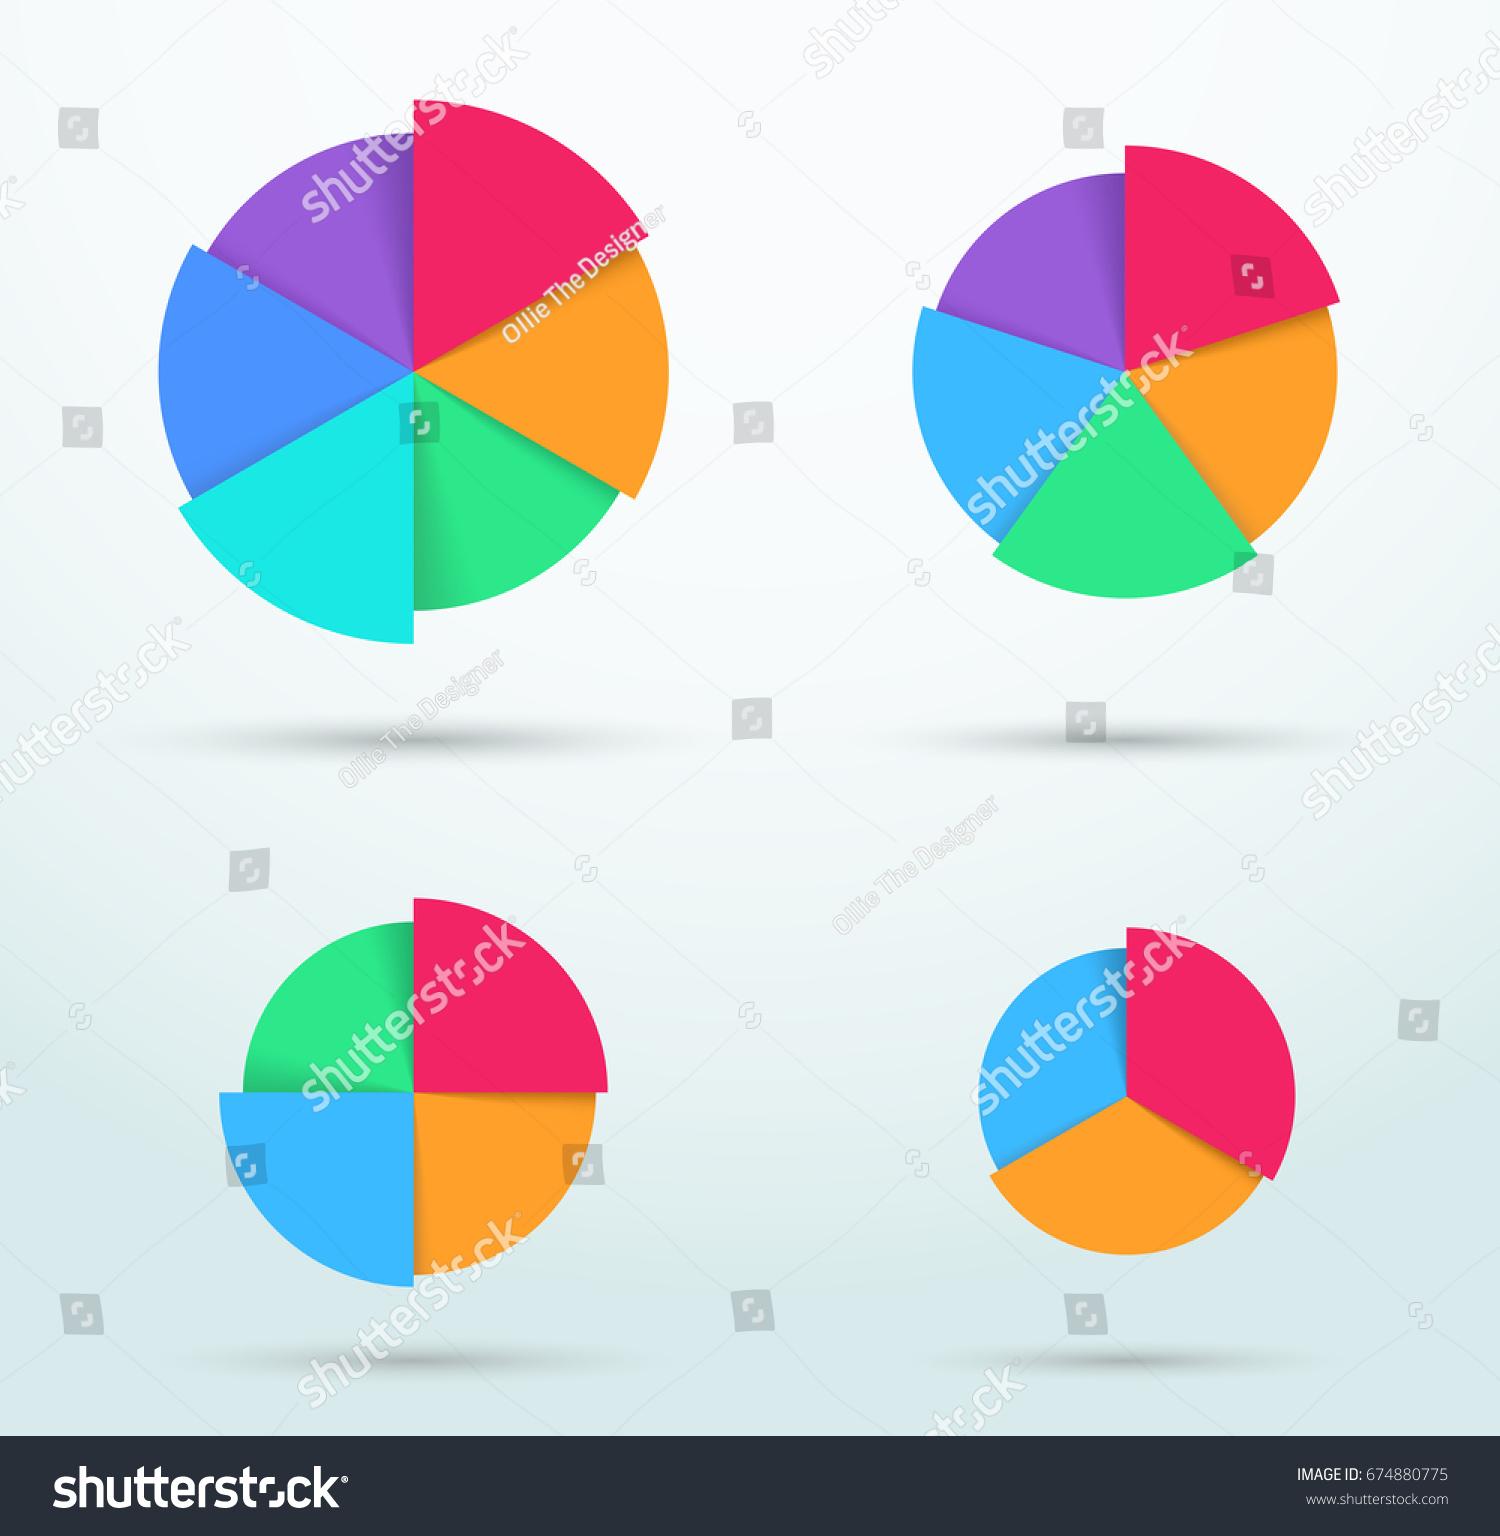 Infographic colorful pie chart segment circles stock vector infographic colorful pie chart segment circles set ccuart Images